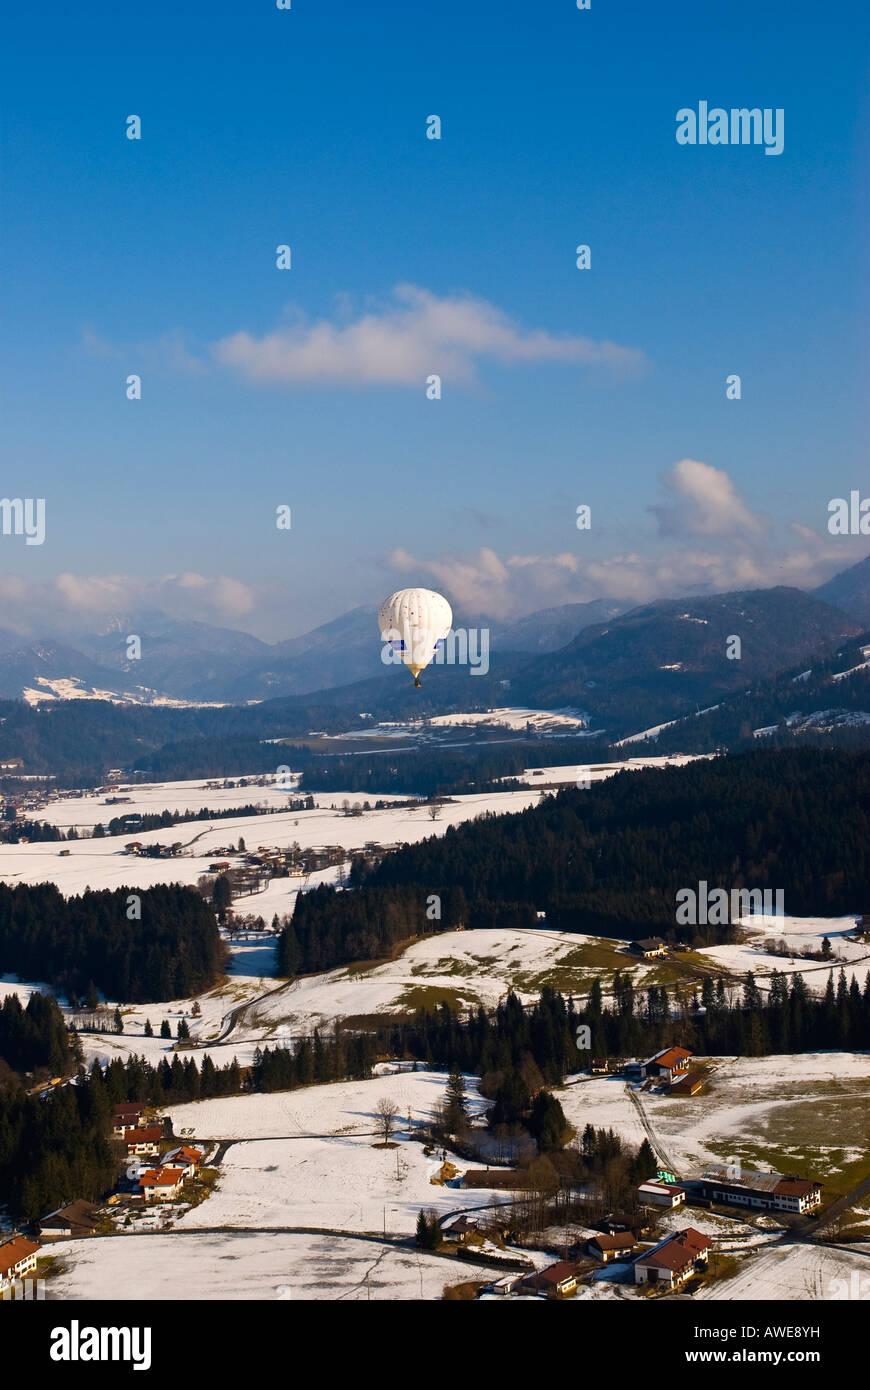 Hot air balloons over Kaiserwinkel, Tirol, Austria, Europe Stock Photo